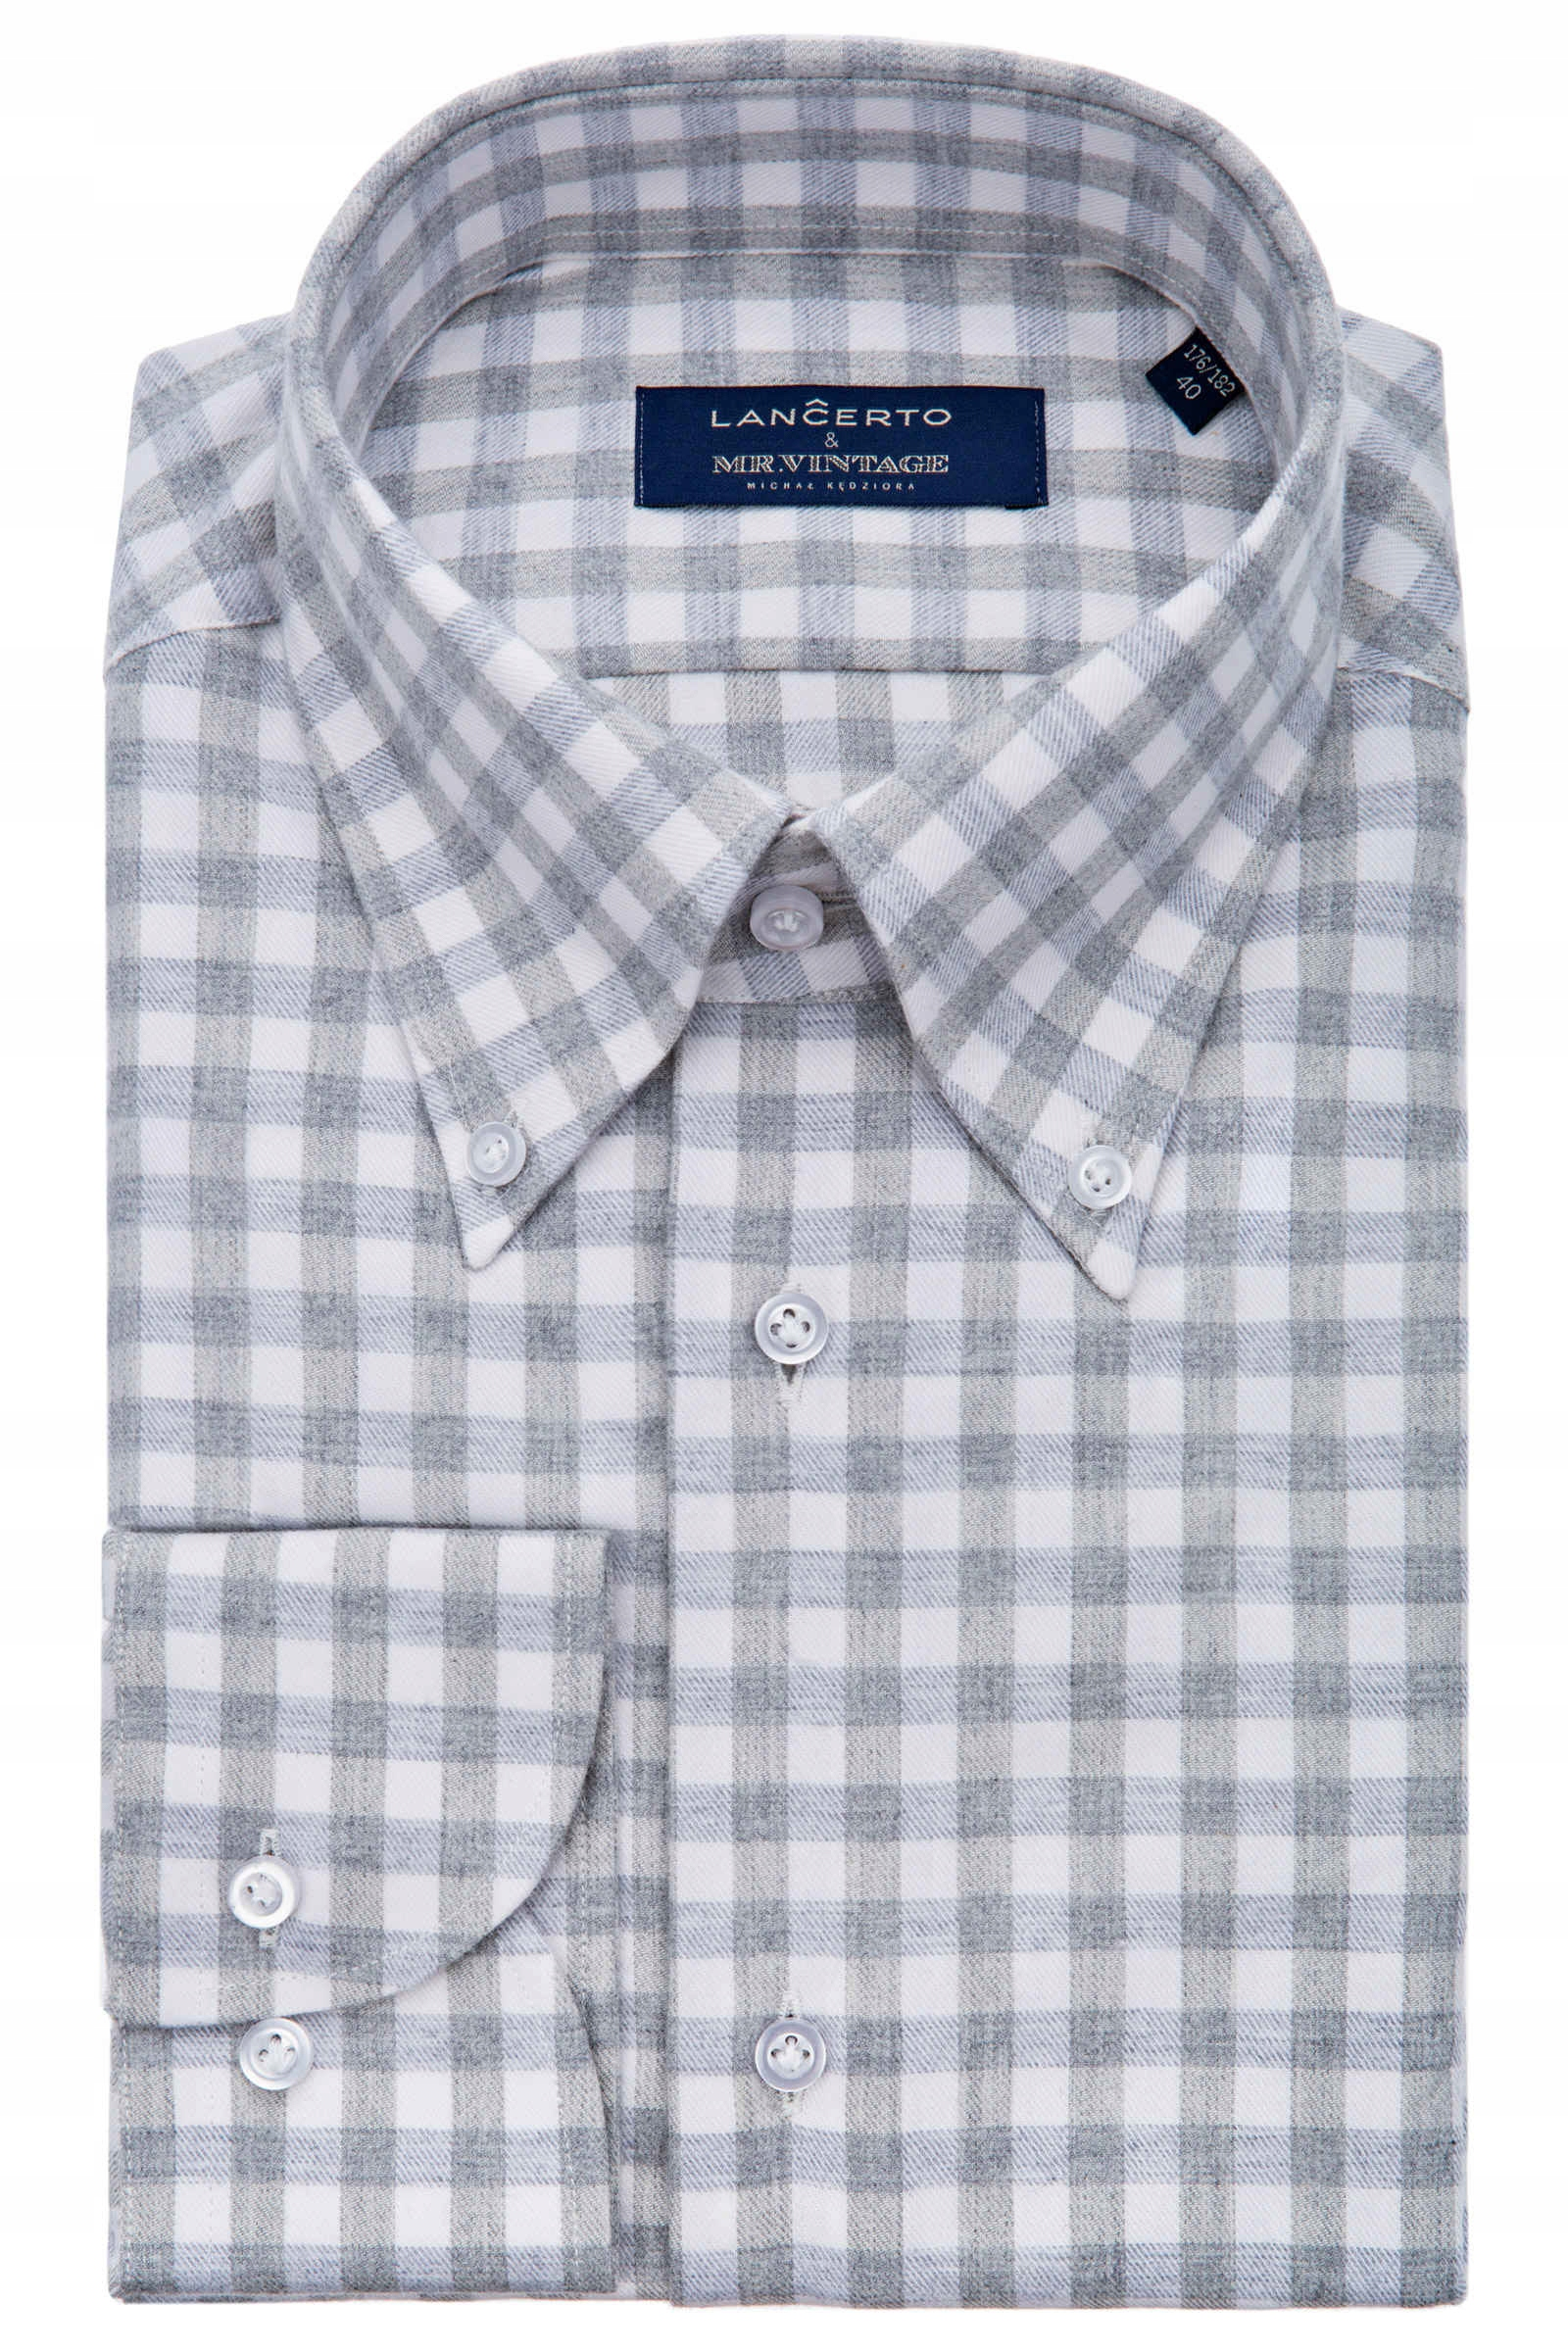 Lancerto tričko&Pán Vintage Medway 176/42